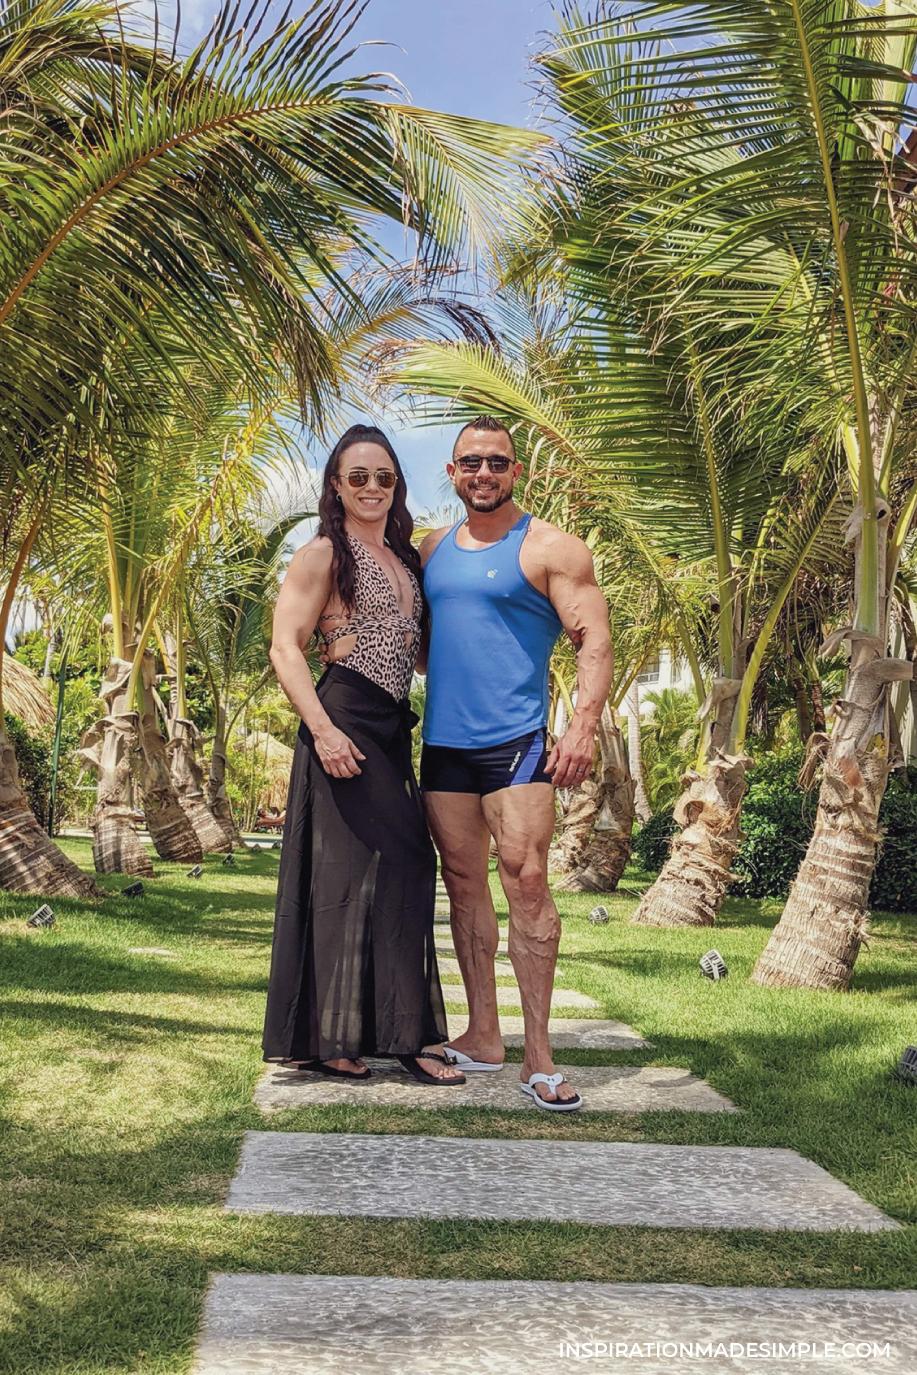 Beautiful landscape design at Dreams Royal Beach in Punta Cana